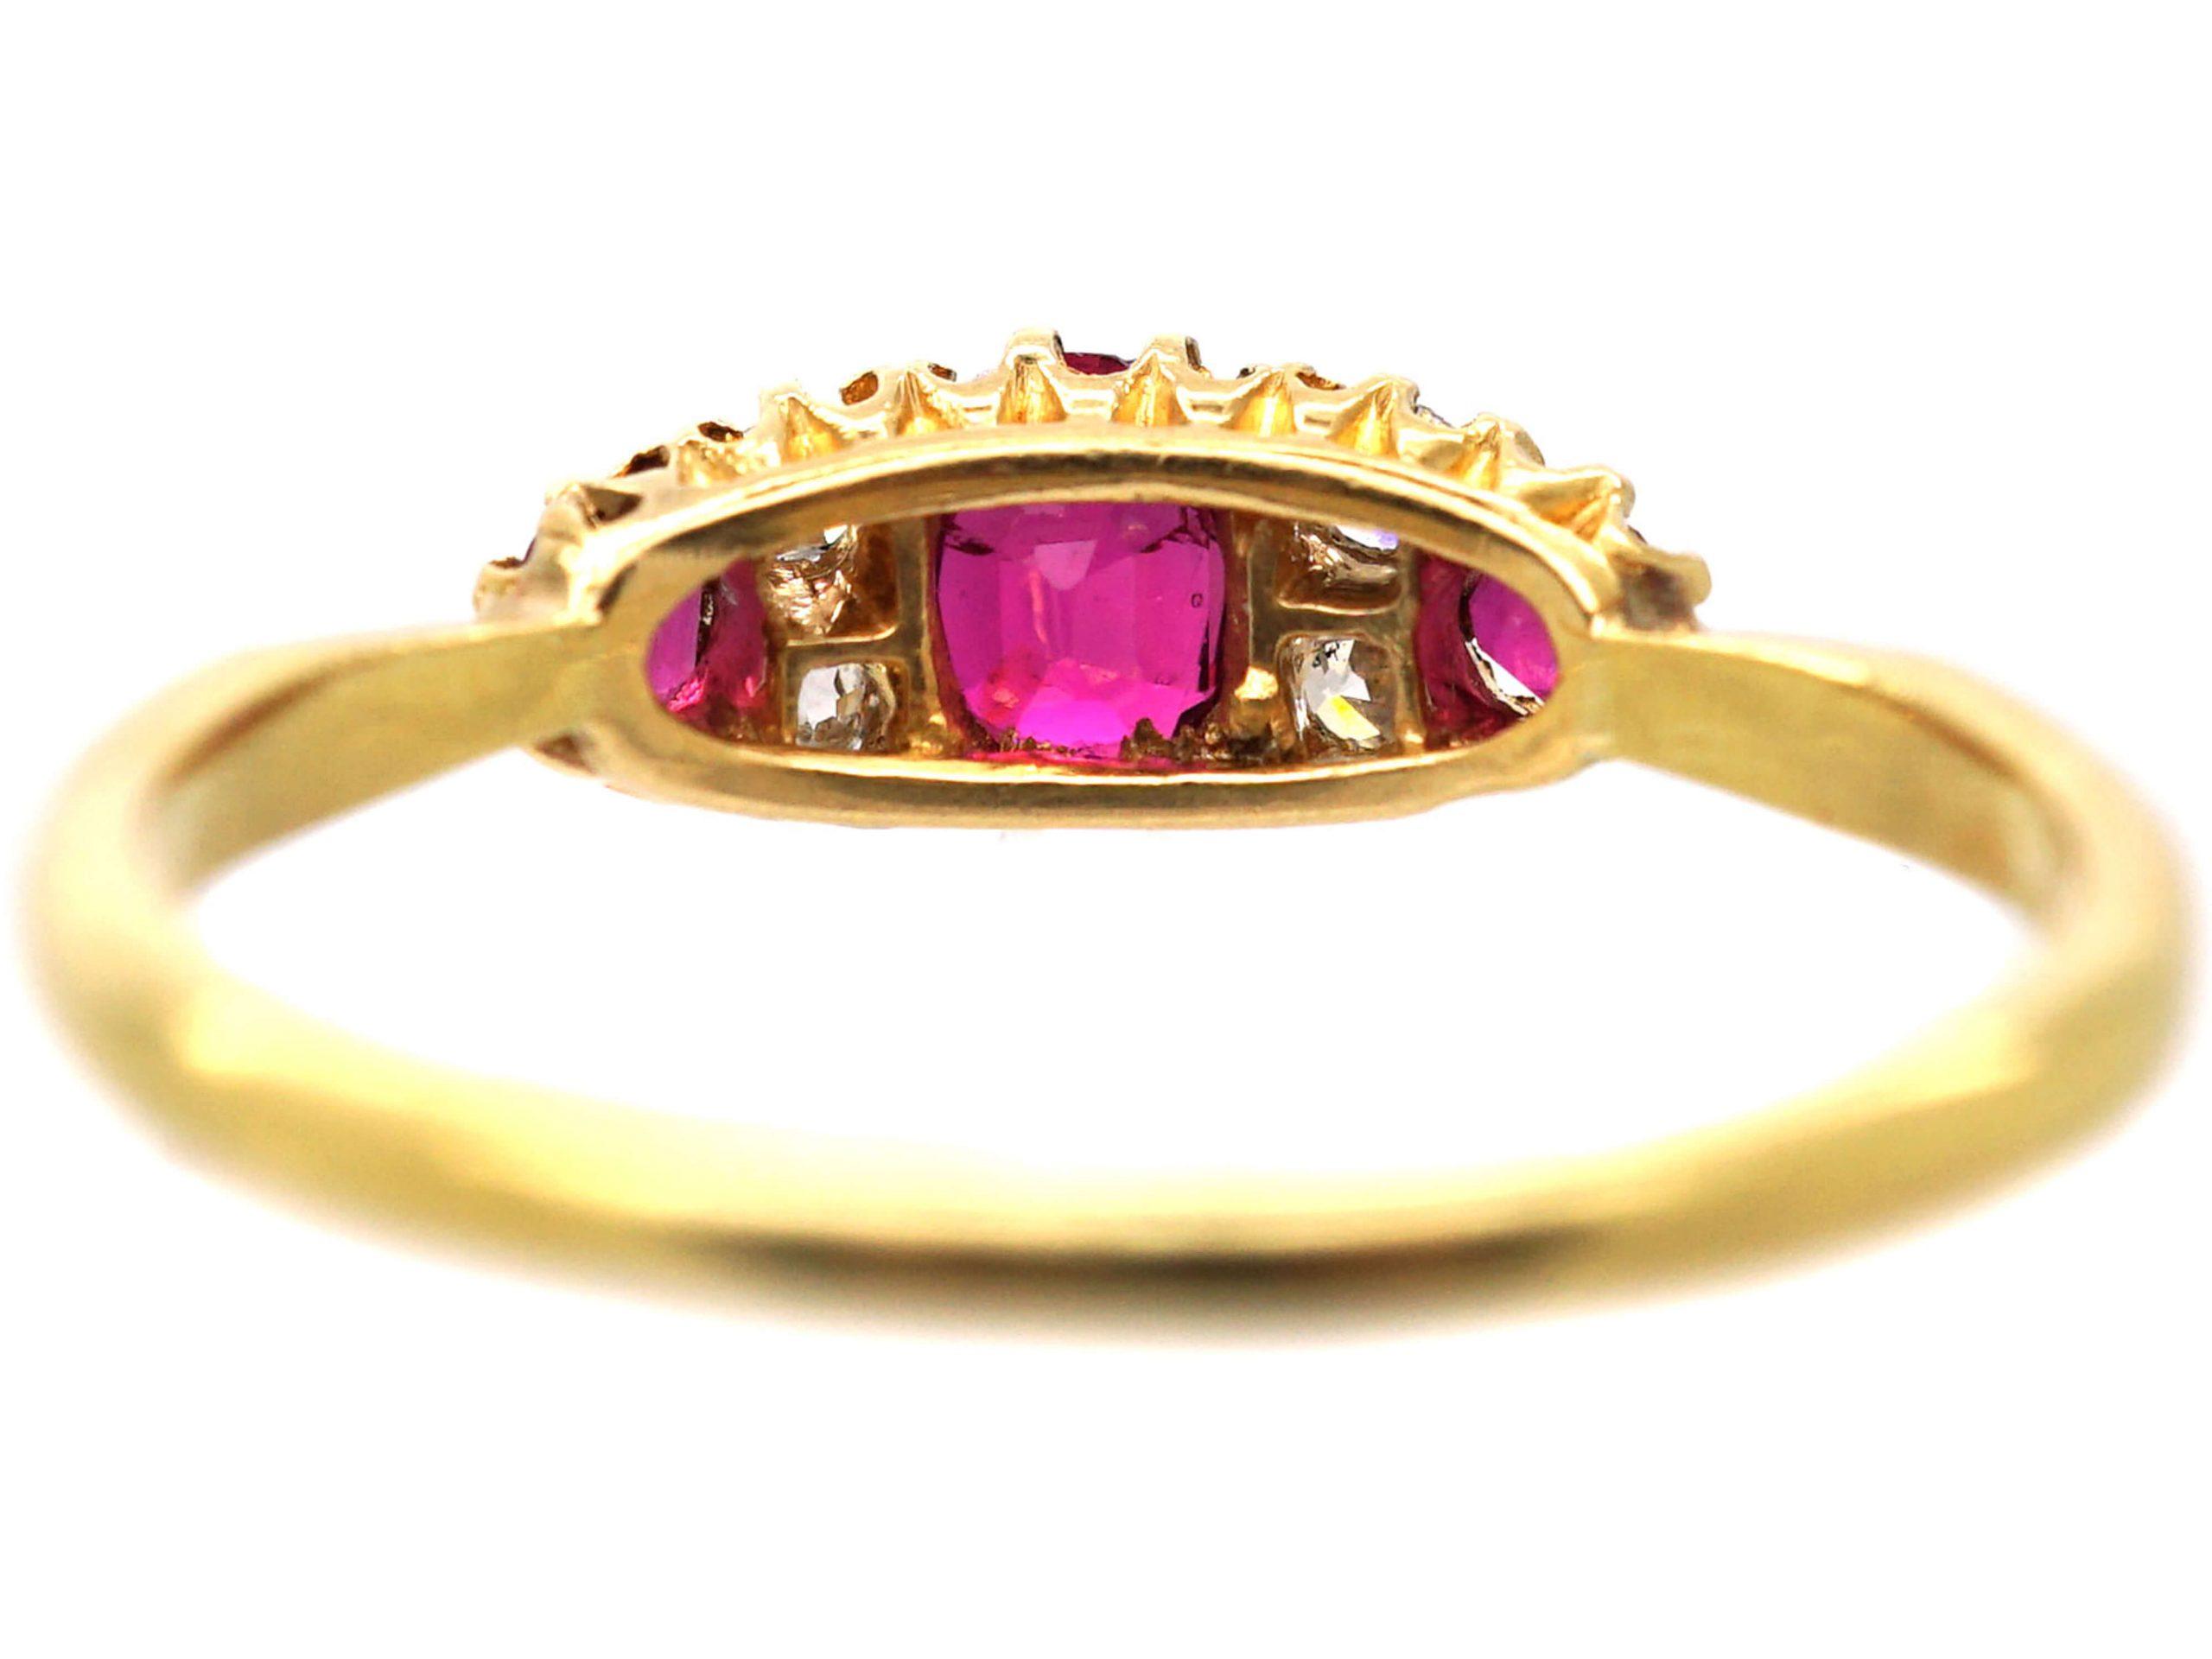 Edwardian 18ct Gold, Ruby & Diamond Three Stone Boat Shaped Ring